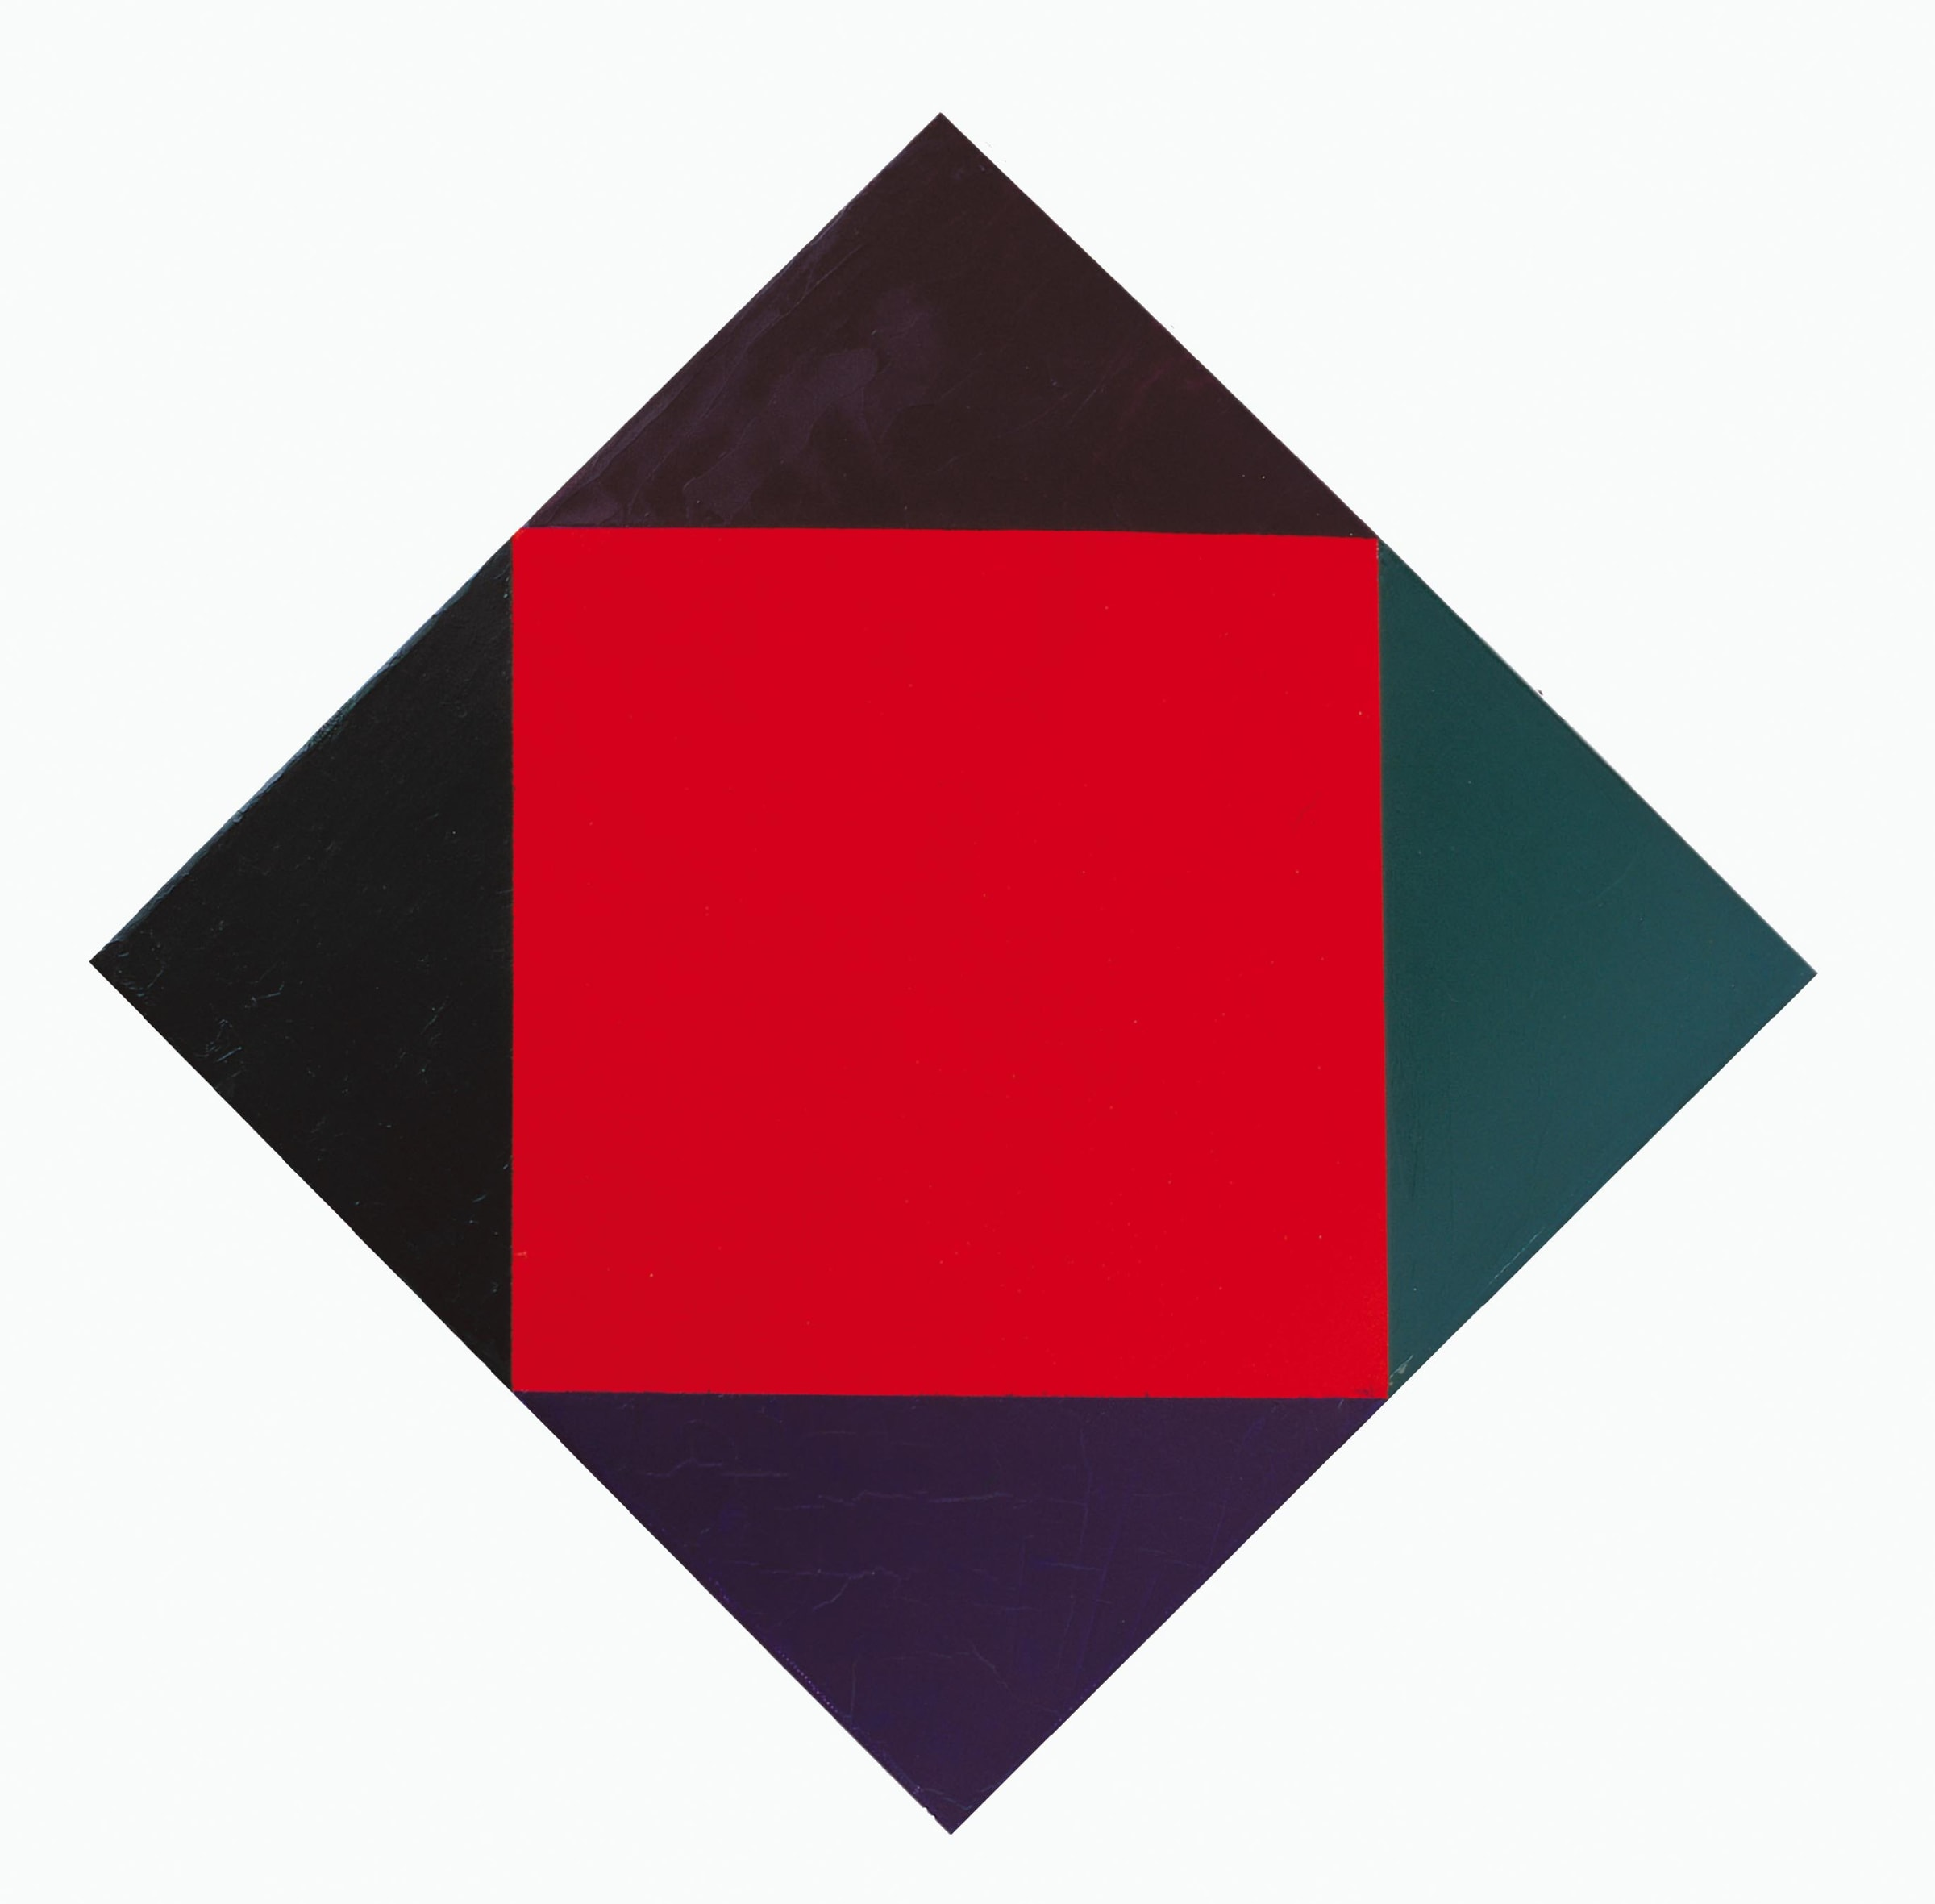 "<span class=""link fancybox-details-link""><a href=""/artists/32-max-bill/works/1383-max-bill-roter-kern-1959-1970/"">View Detail Page</a></span><div class=""artist""><strong>Max Bill</strong></div> <div class=""title""><em>roter kern</em>, 1959-1970</div> <div class=""medium"">olio su tela</div> <div class=""dimensions"">cm 33x33</div><div class=""copyright_line"">Copyright Lorenzelli Arte</div>"